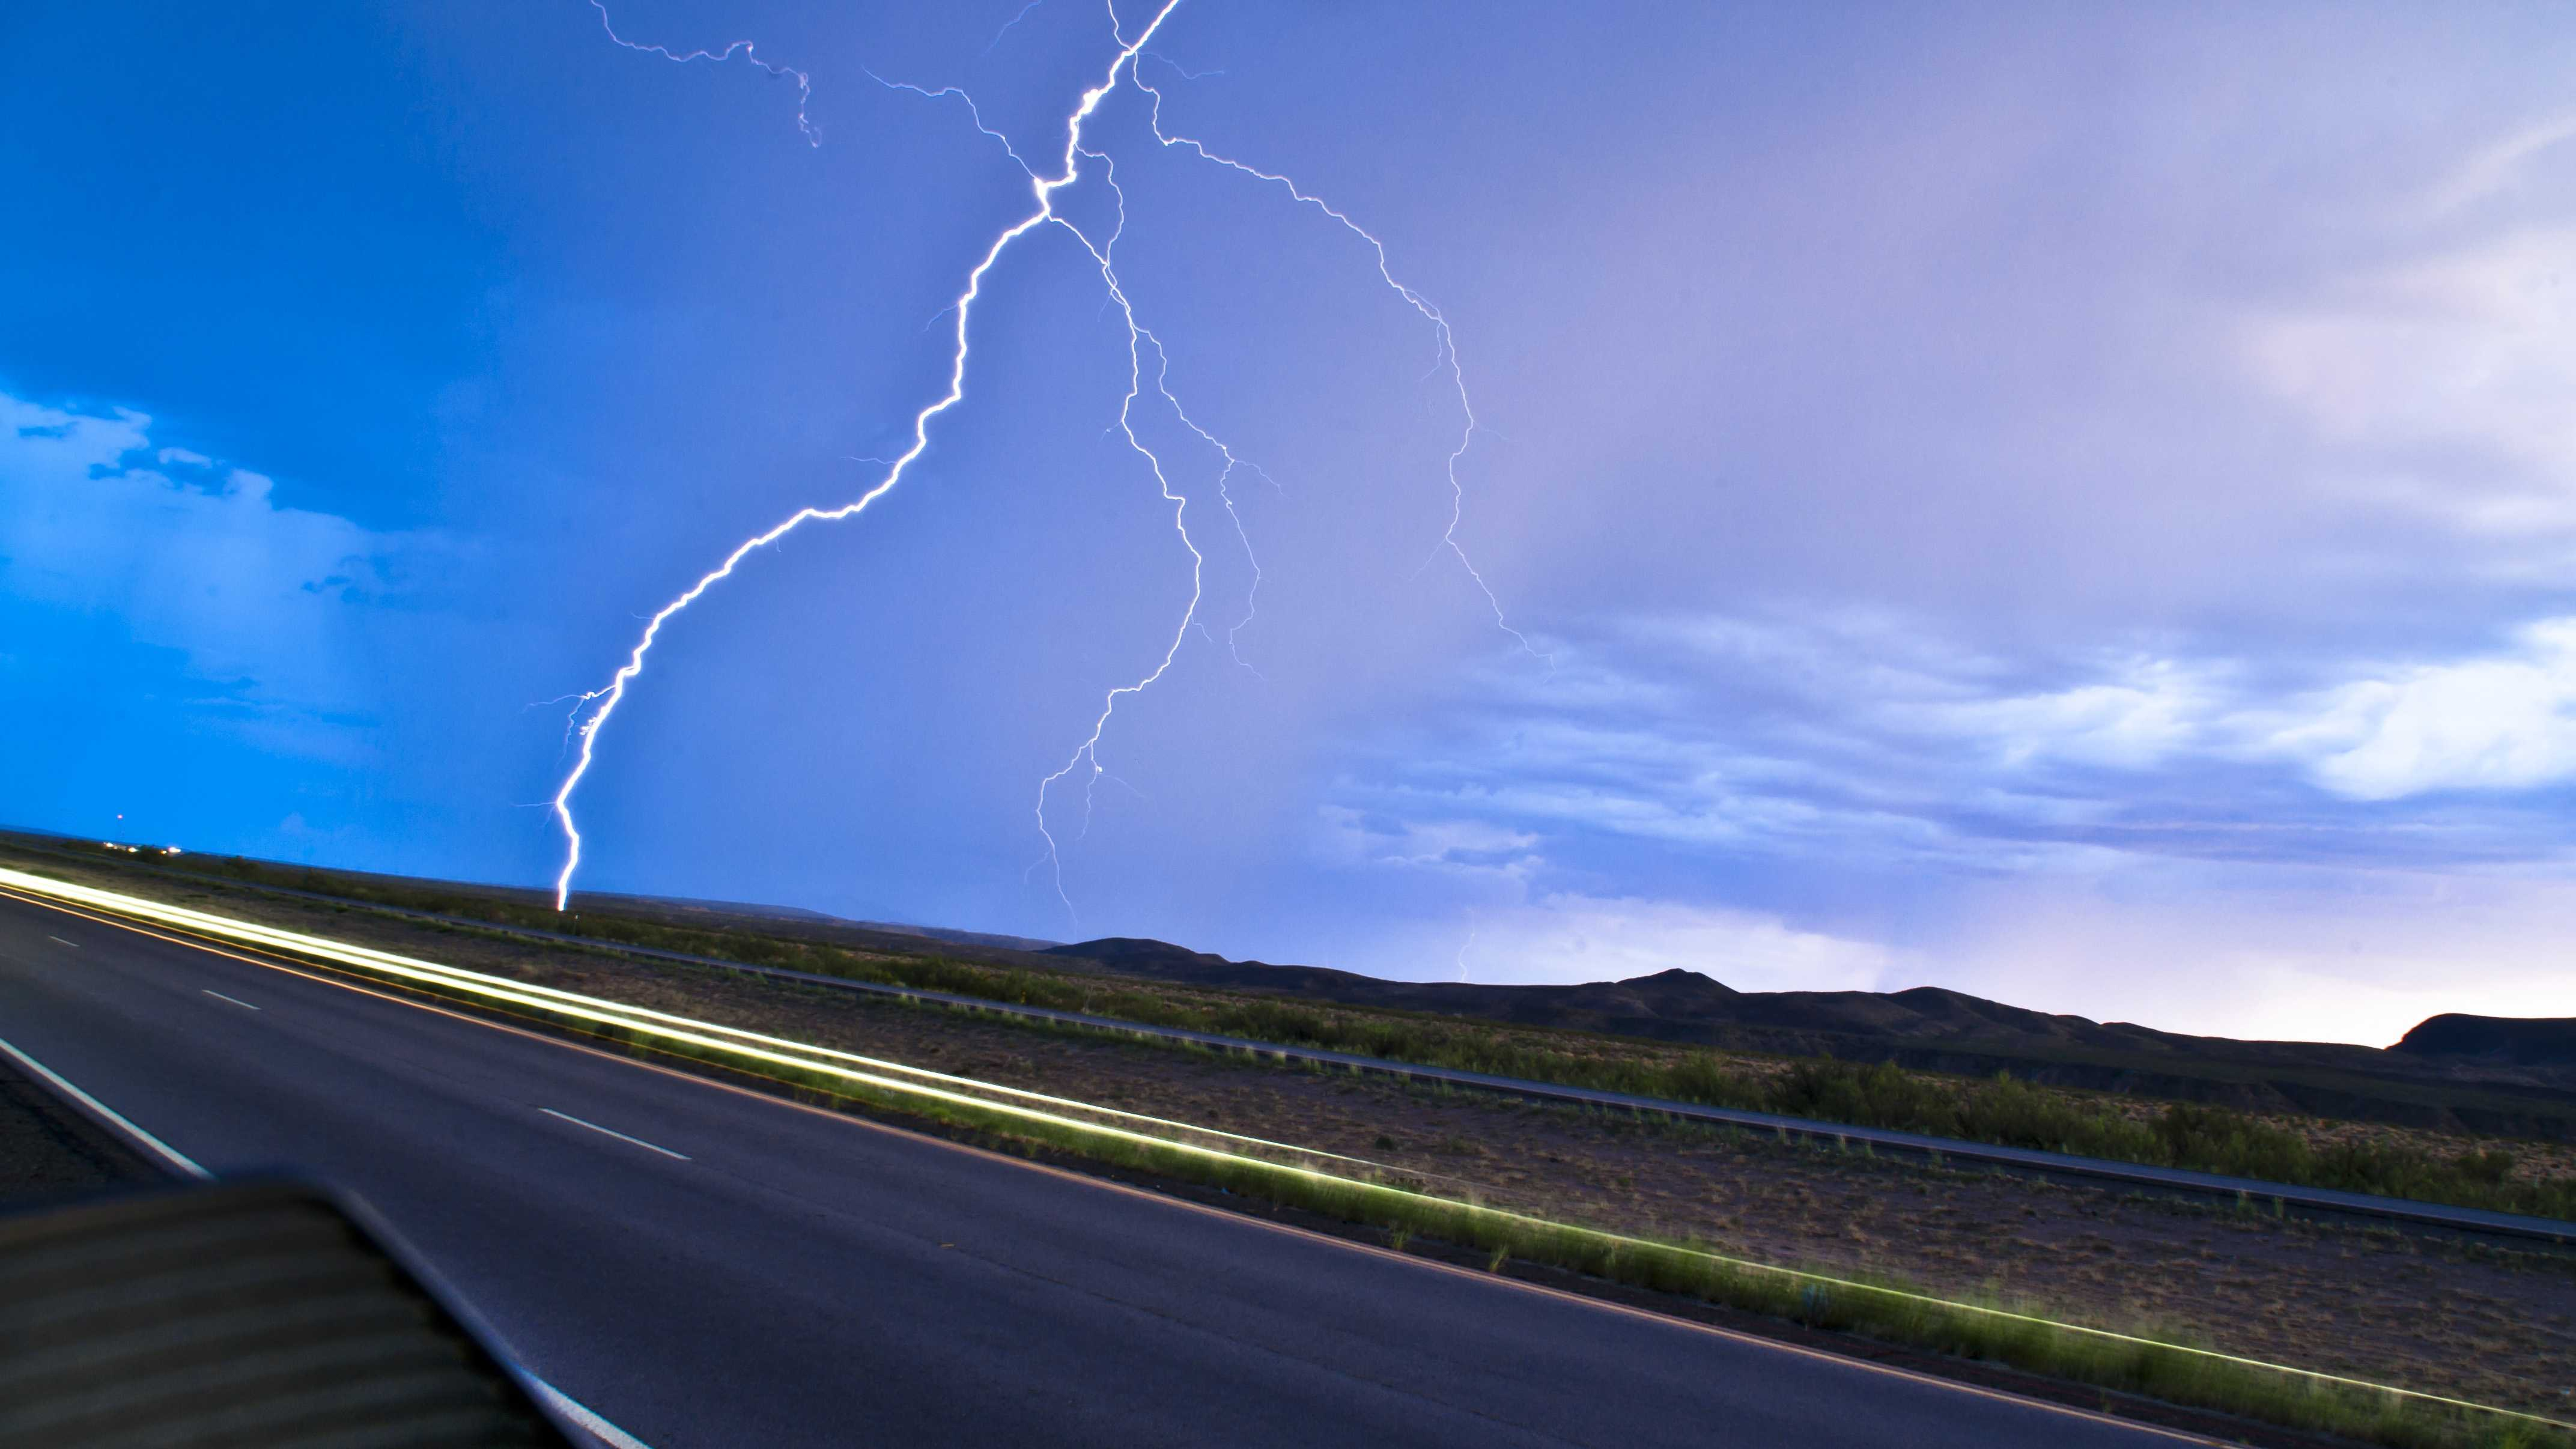 u local lightning